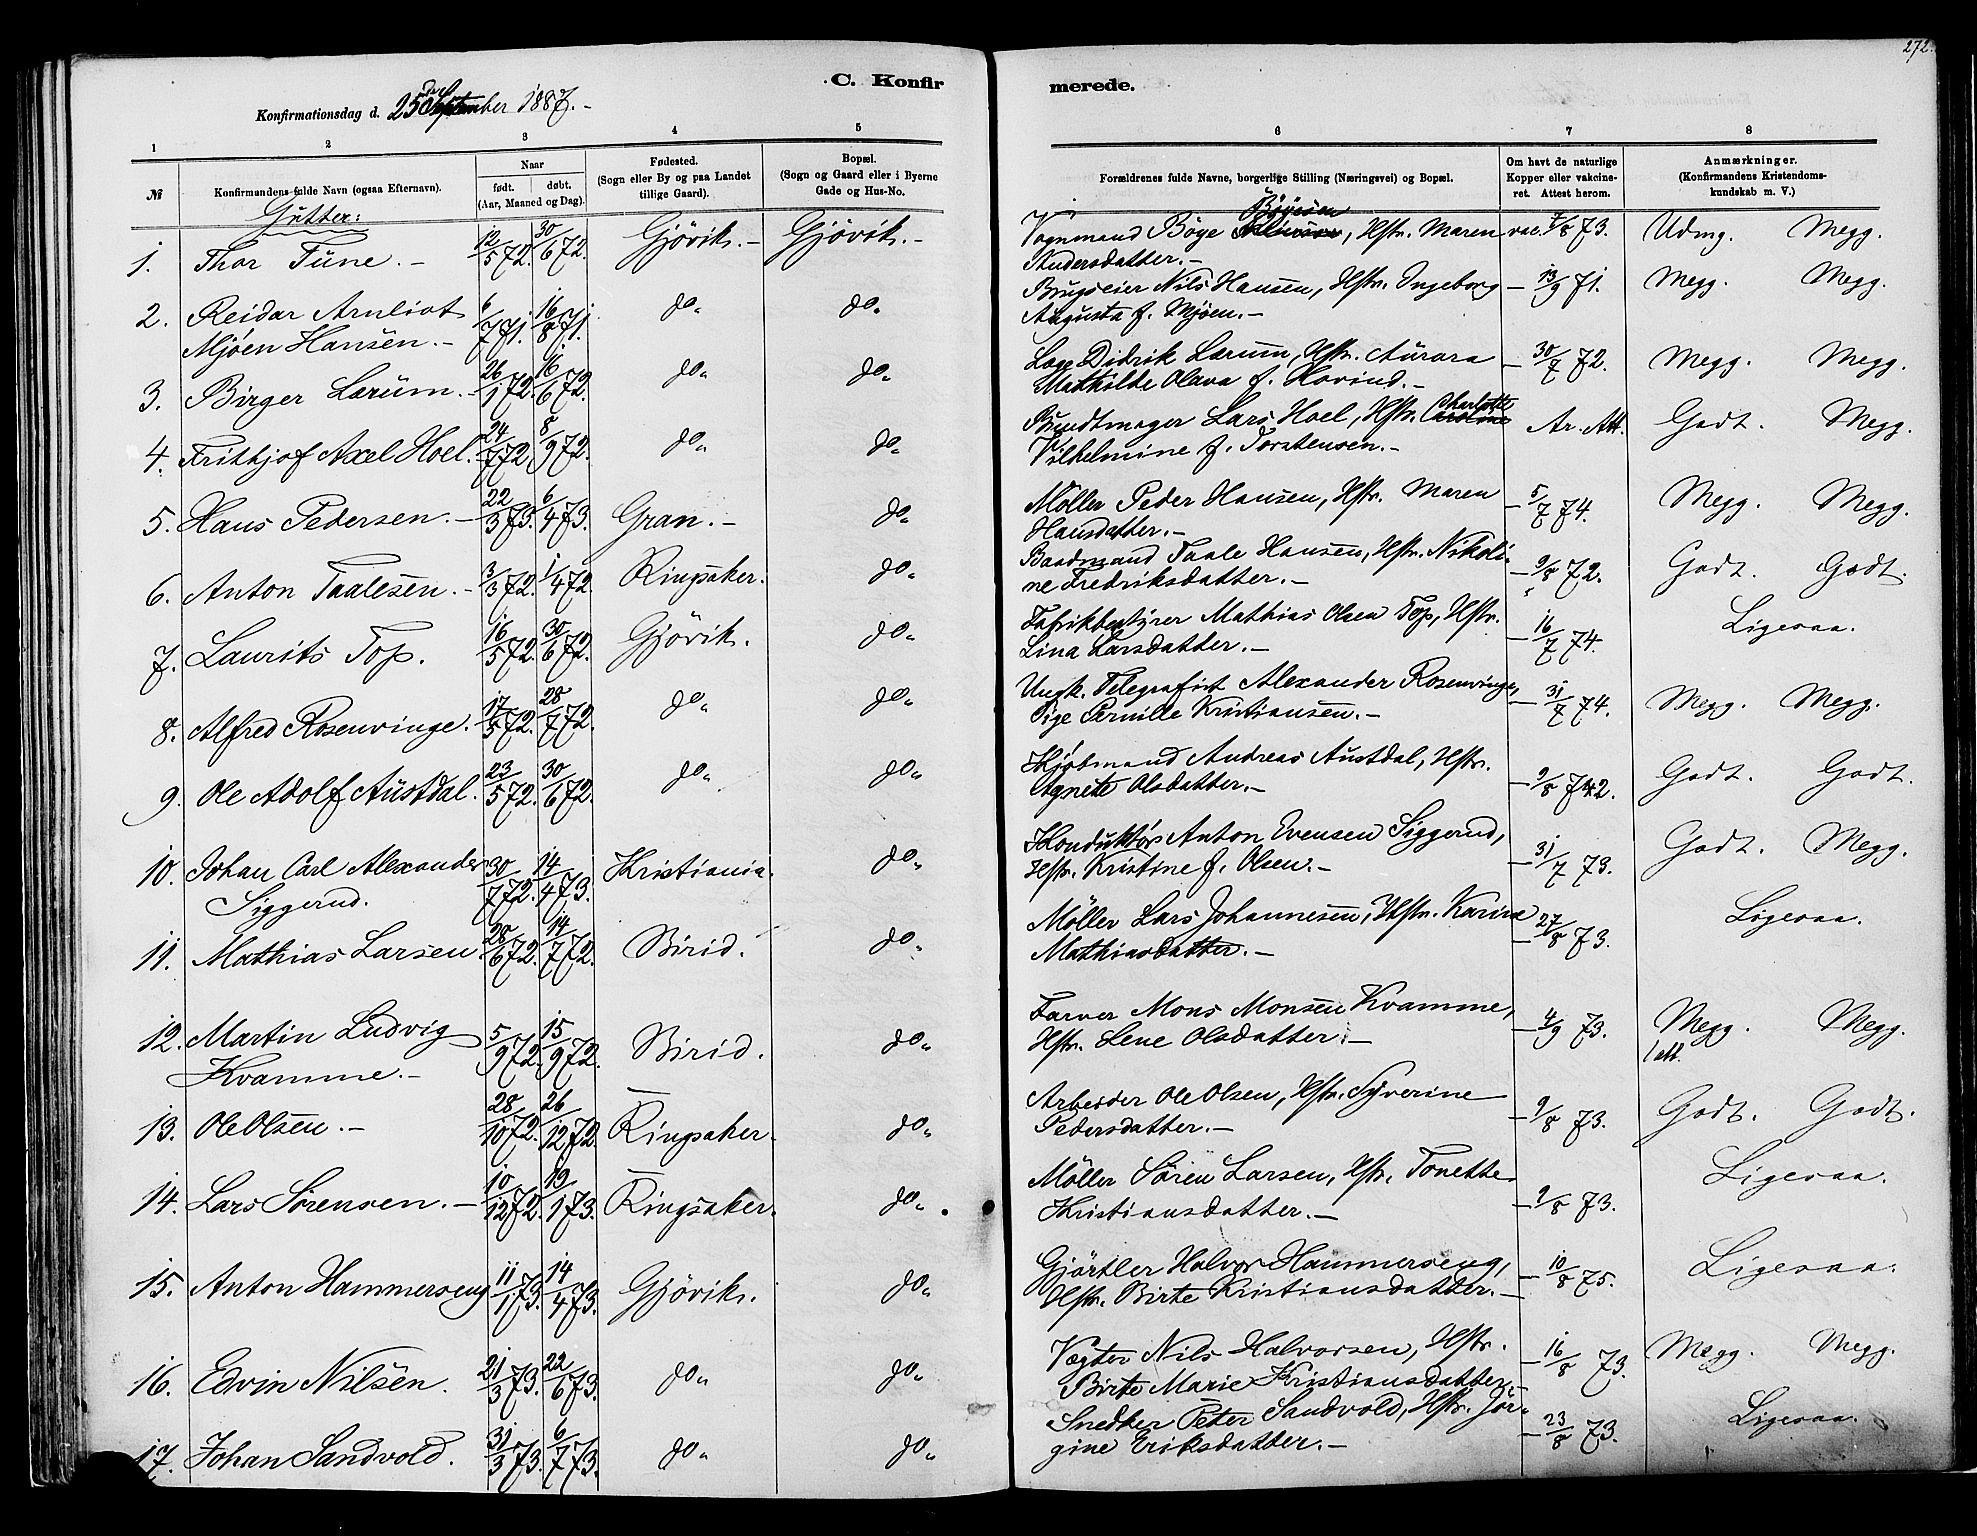 SAH, Vardal prestekontor, H/Ha/Haa/L0008: Ministerialbok nr. 8, 1878-1890, s. 272